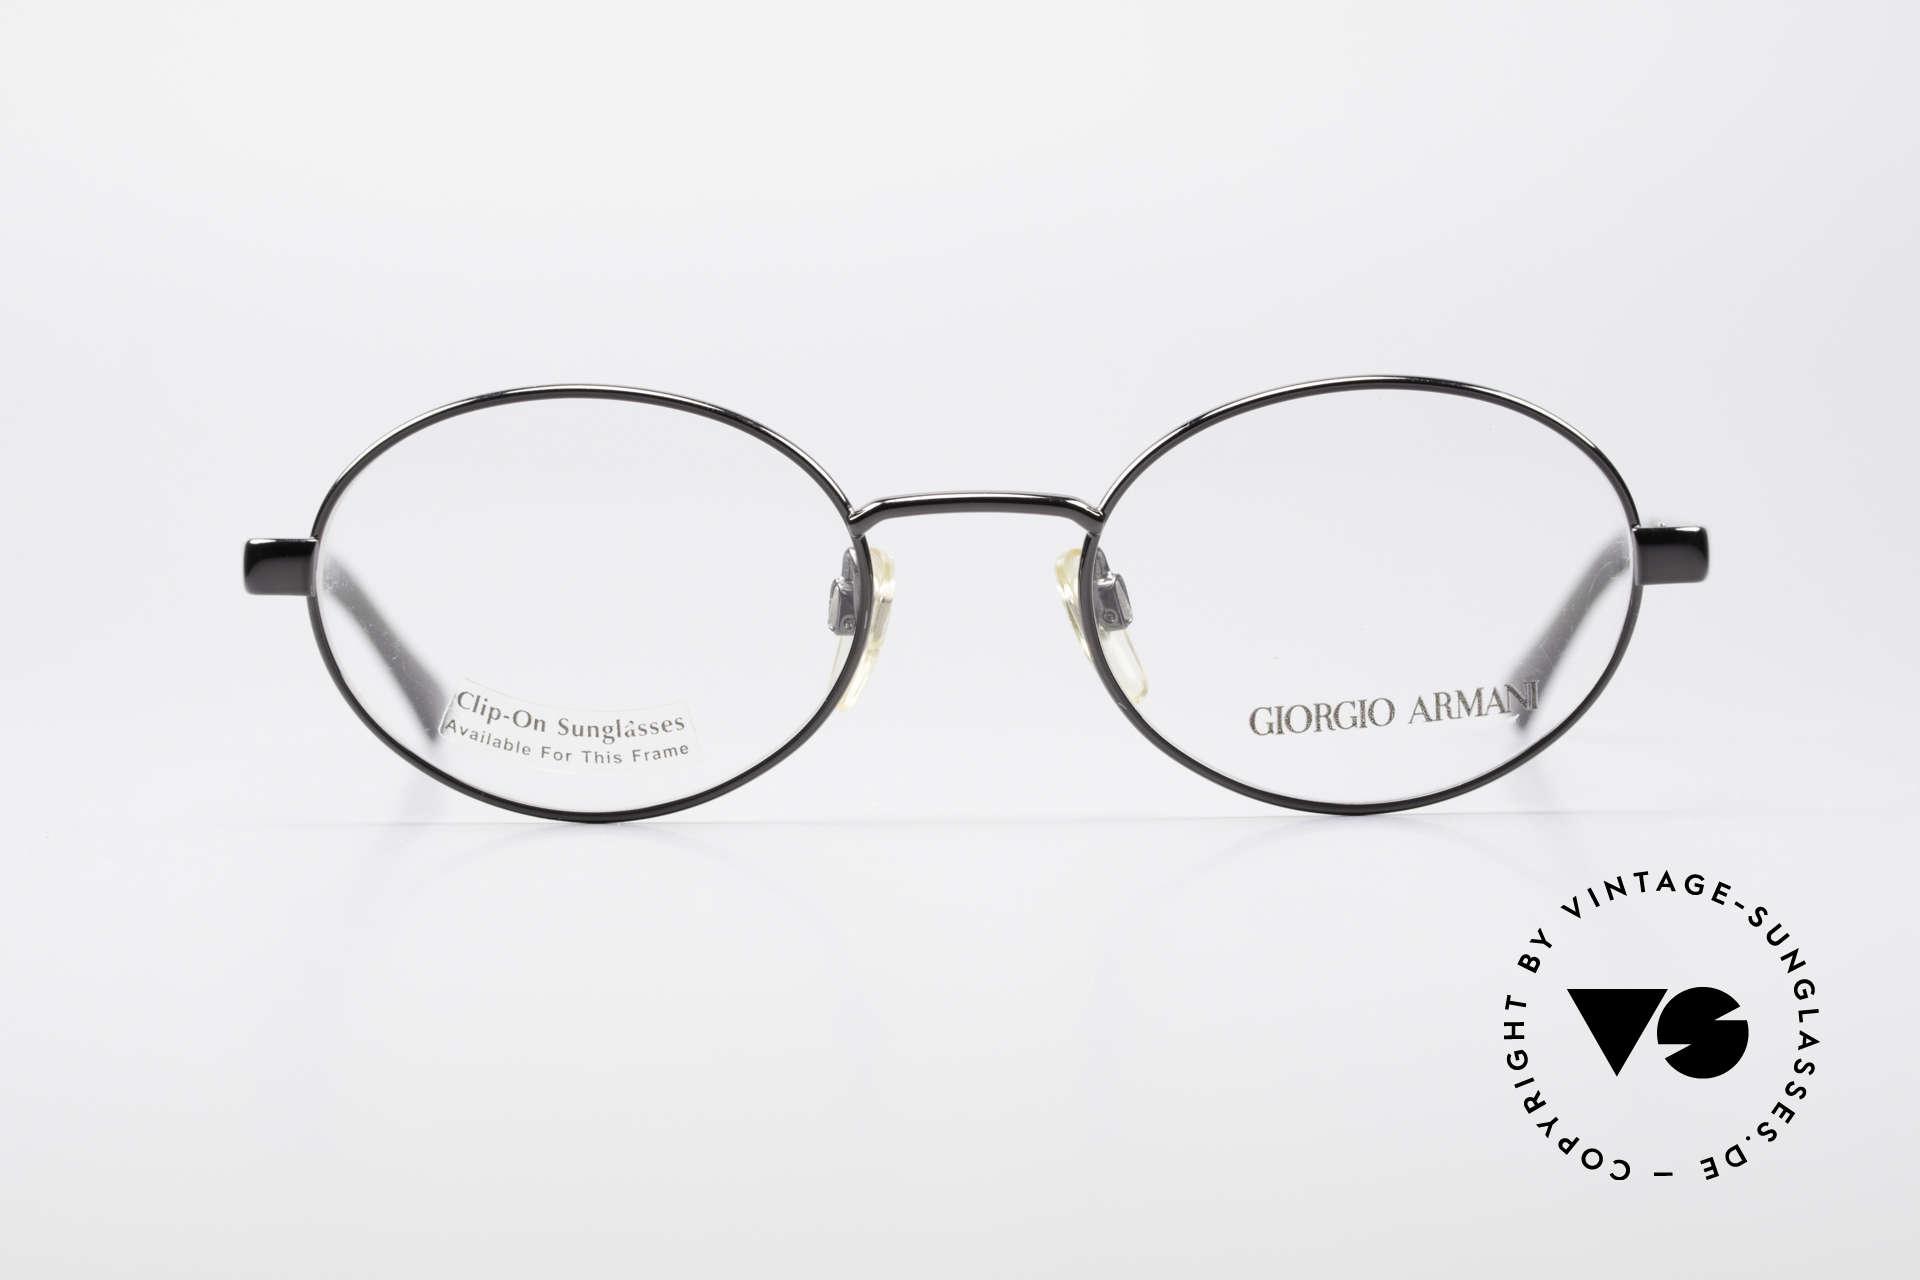 6368107107d9 Glasses Giorgio Armani 257 90s Oval Vintage Eyeglasses